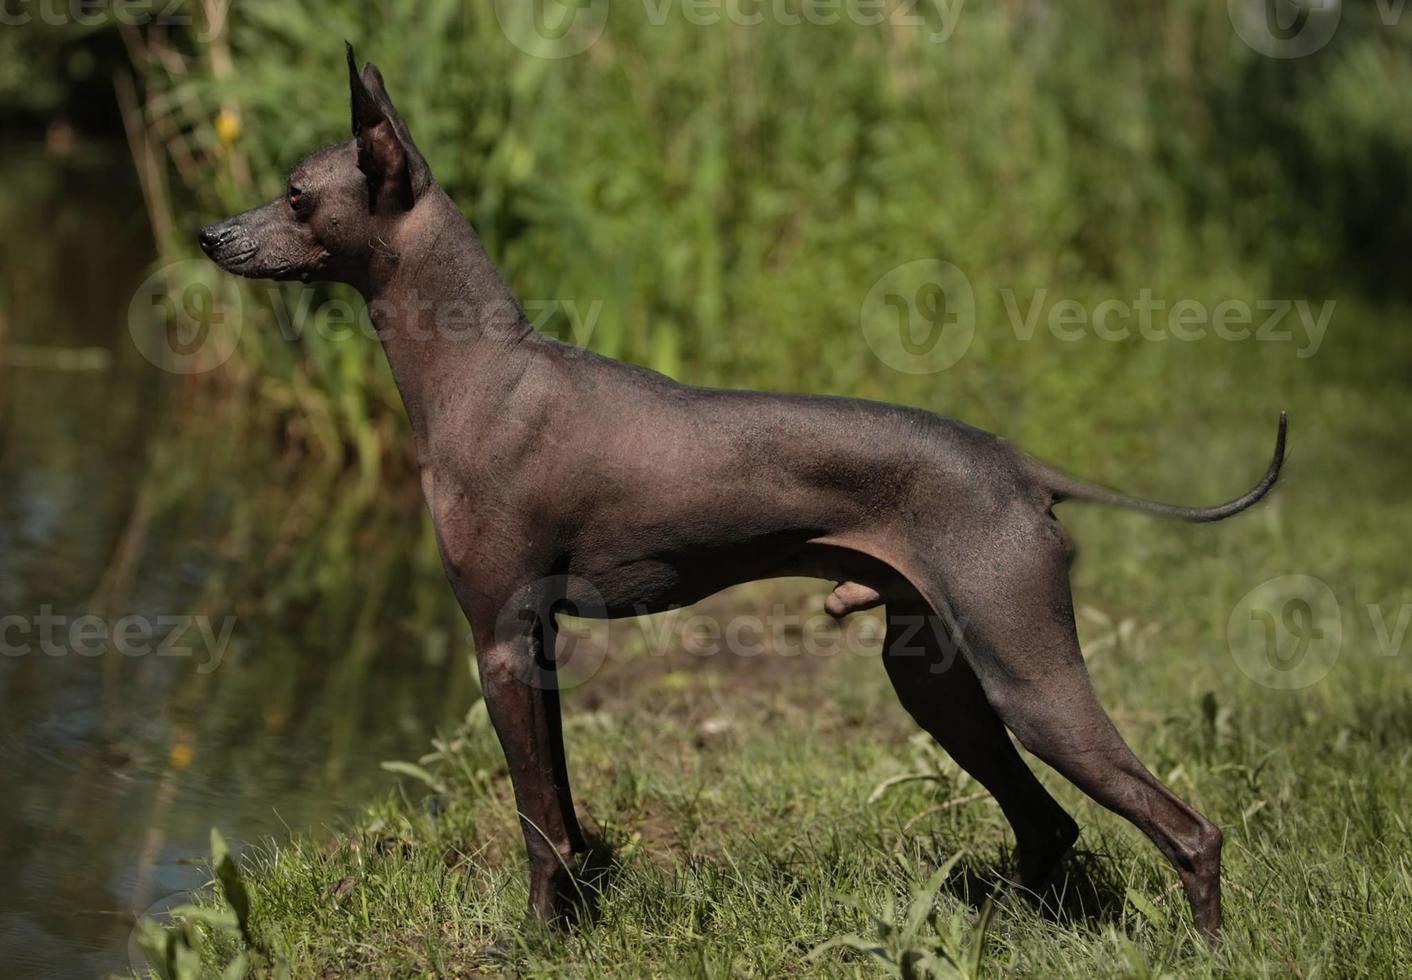 Peruaanse haarloze hond, chien noble sagan, peruaanse naakthond, naakthond foto